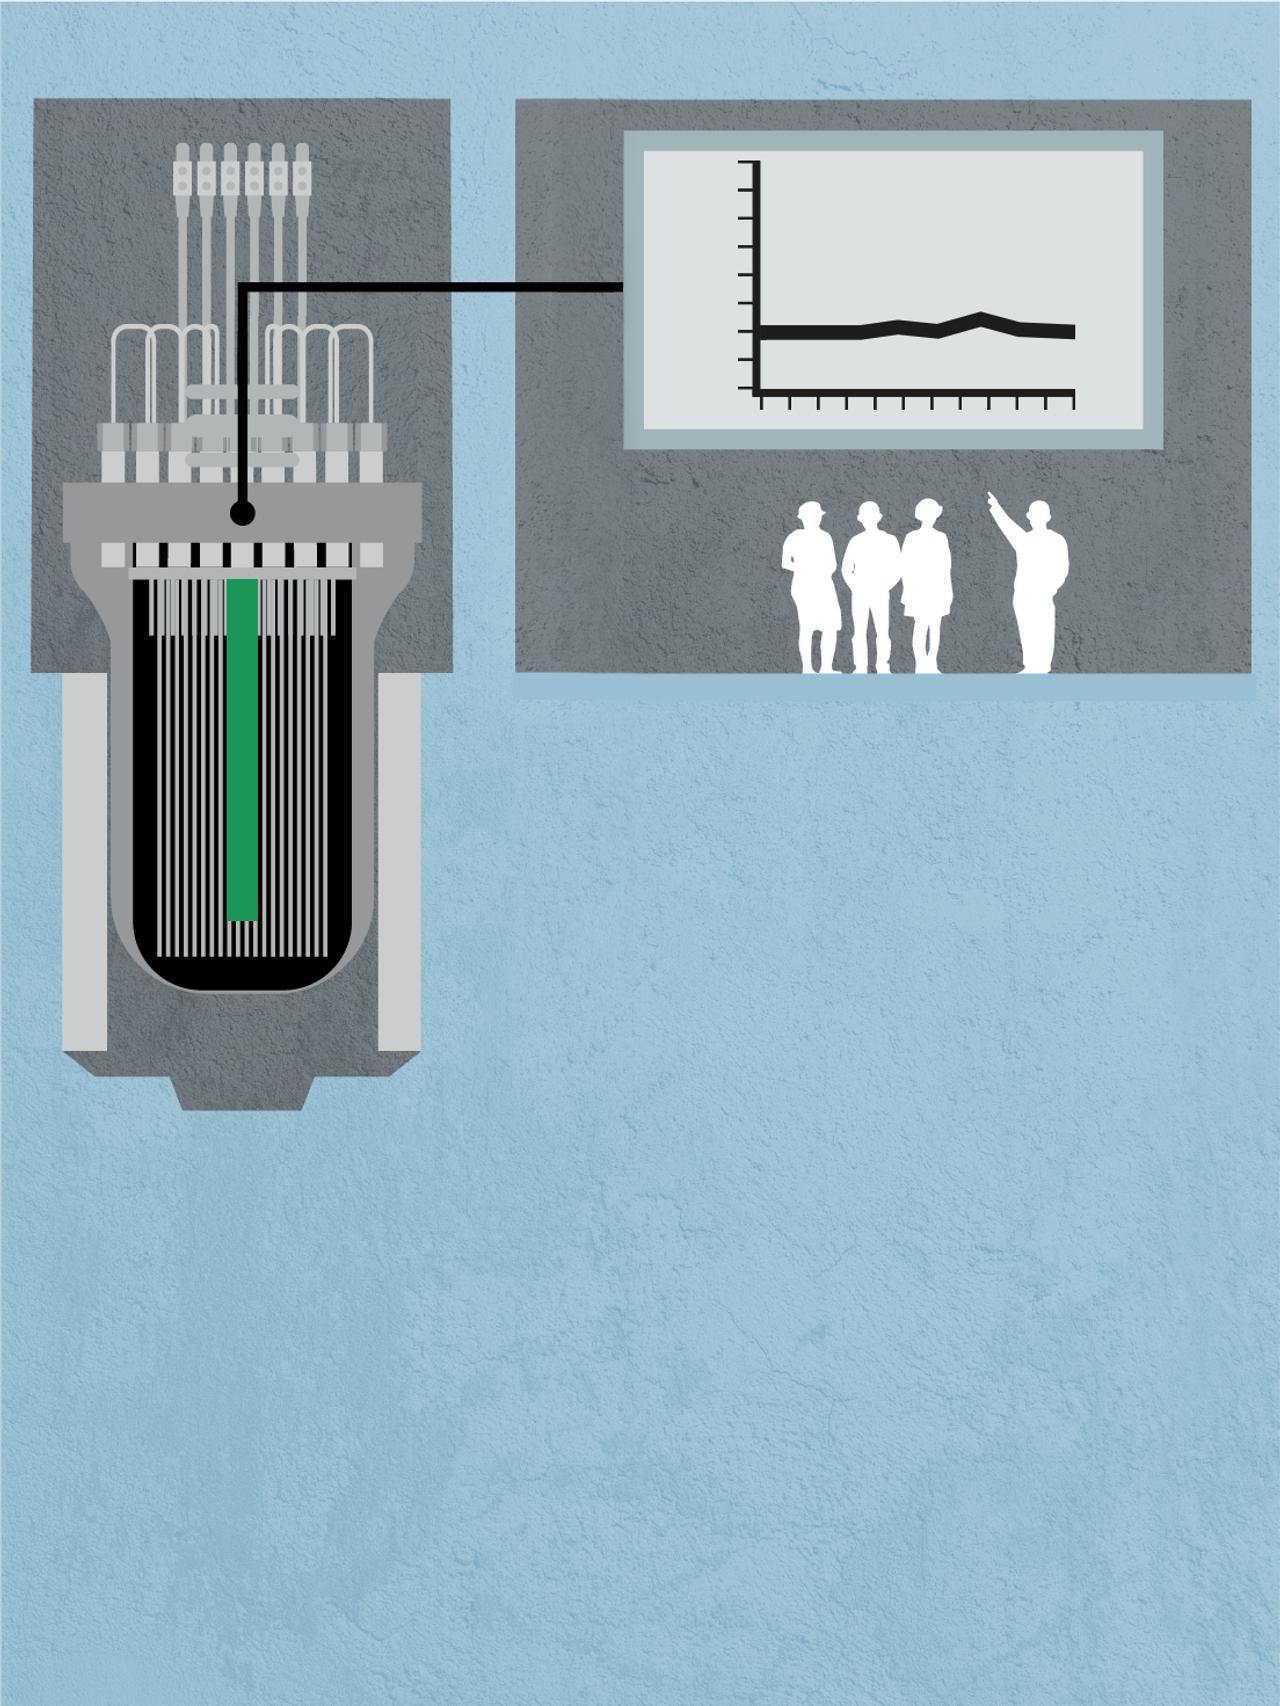 Atomreaktor illustrasjon del 2